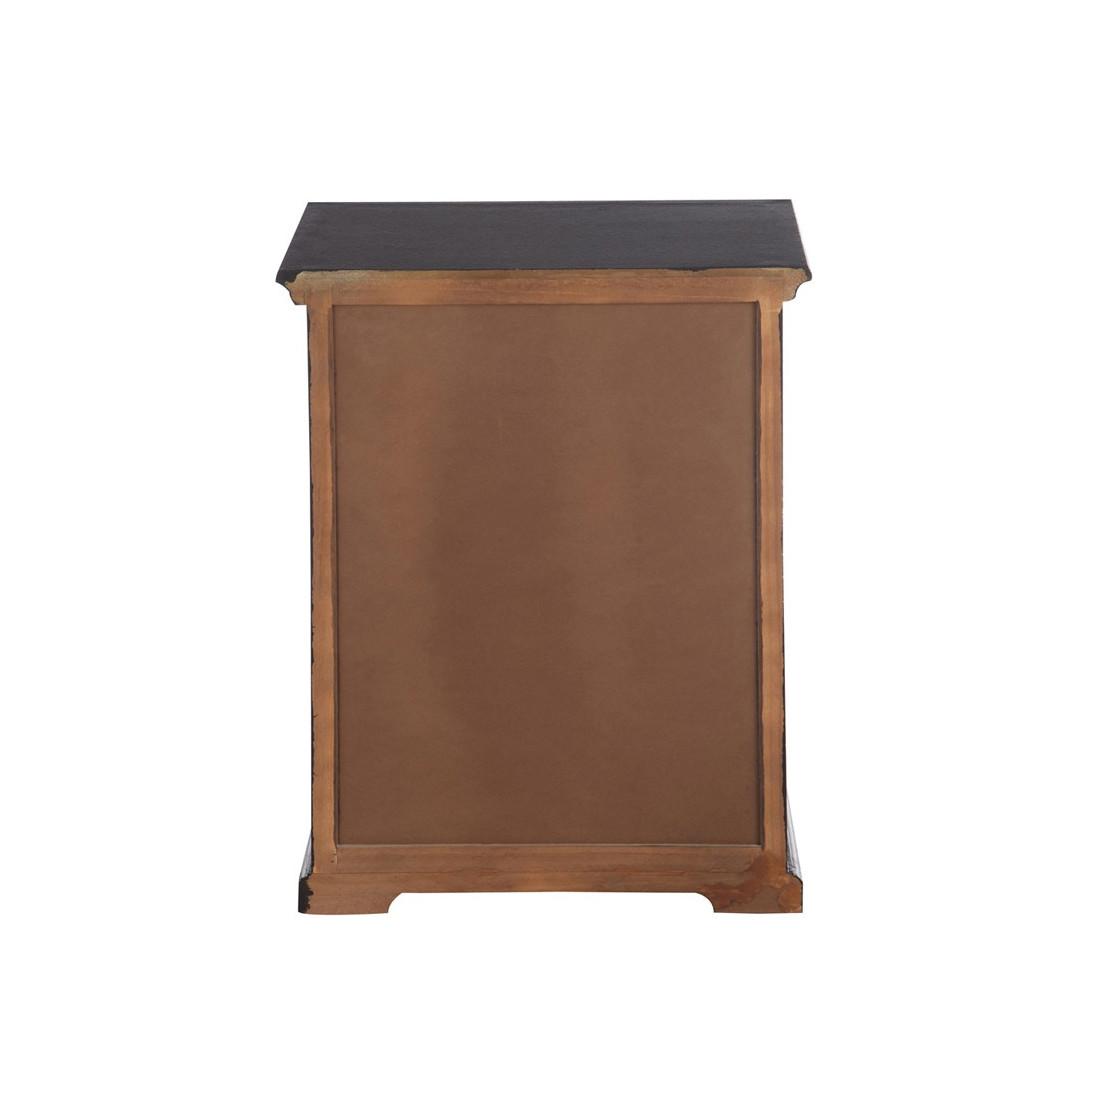 Table de chevet fa ade m tal multimet univers de la chambre - Table de chevet metal ...